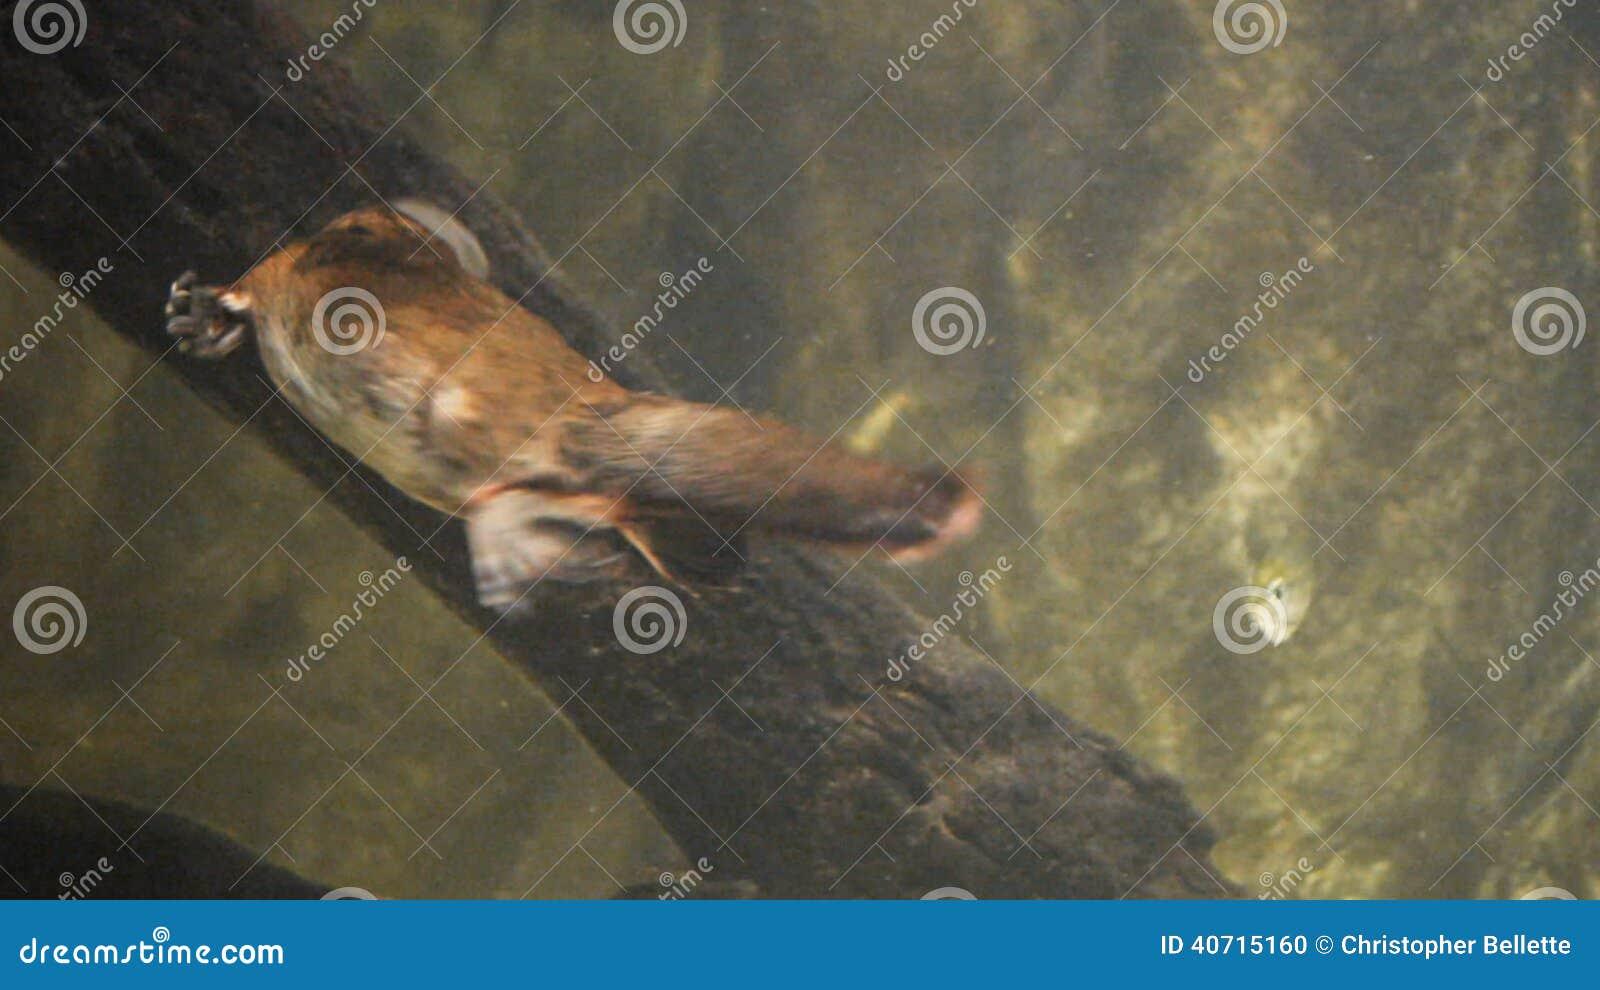 Platypus Injury